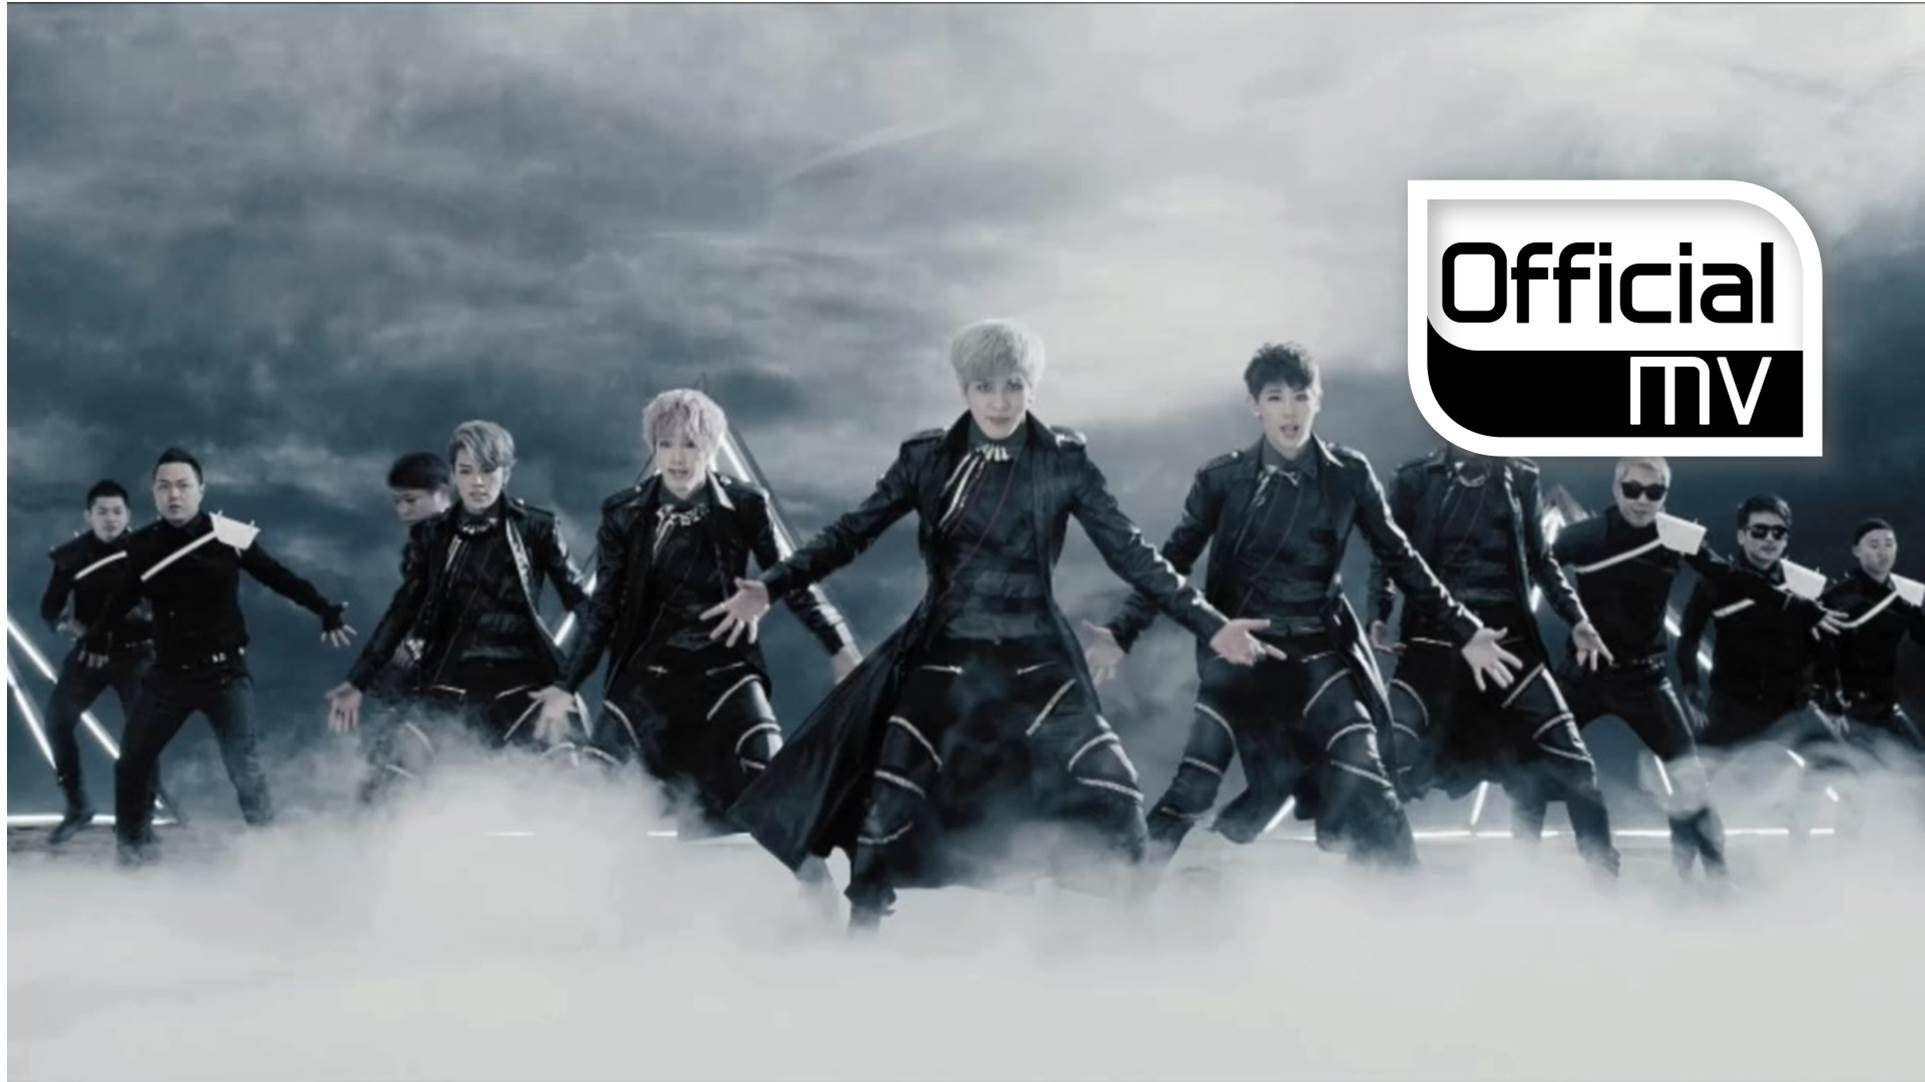 2014.07.04 【Eng sub付】[MV] LU:KUS(ルーカス) _ So Into U(기가막혀)